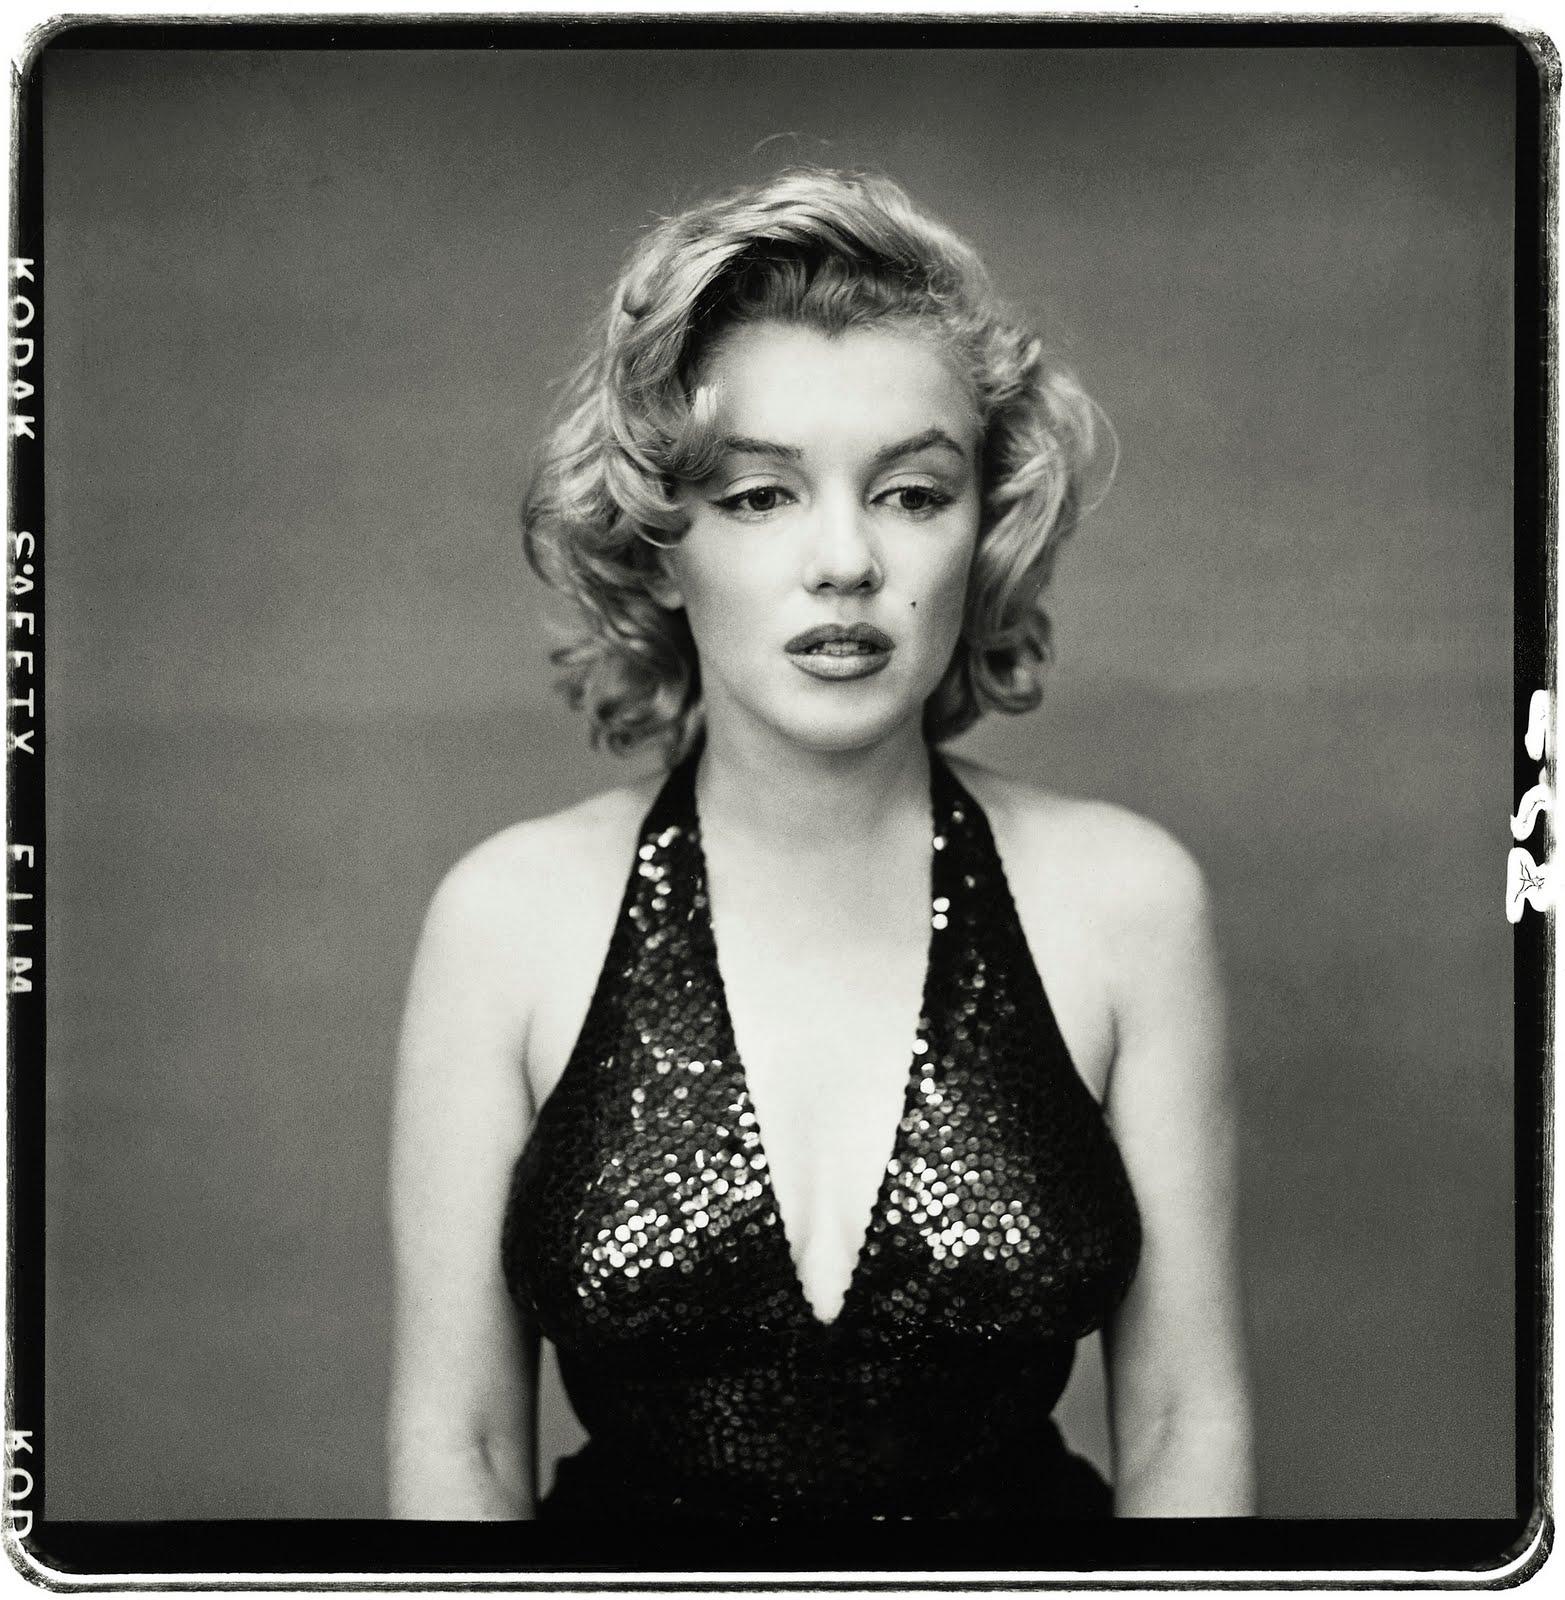 http://1.bp.blogspot.com/-TfnRs5_WDp8/TgMi6O_GXsI/AAAAAAAAARI/tHlnrk4Rvp4/s1600/Avedon_MarilynMonroe.jpg